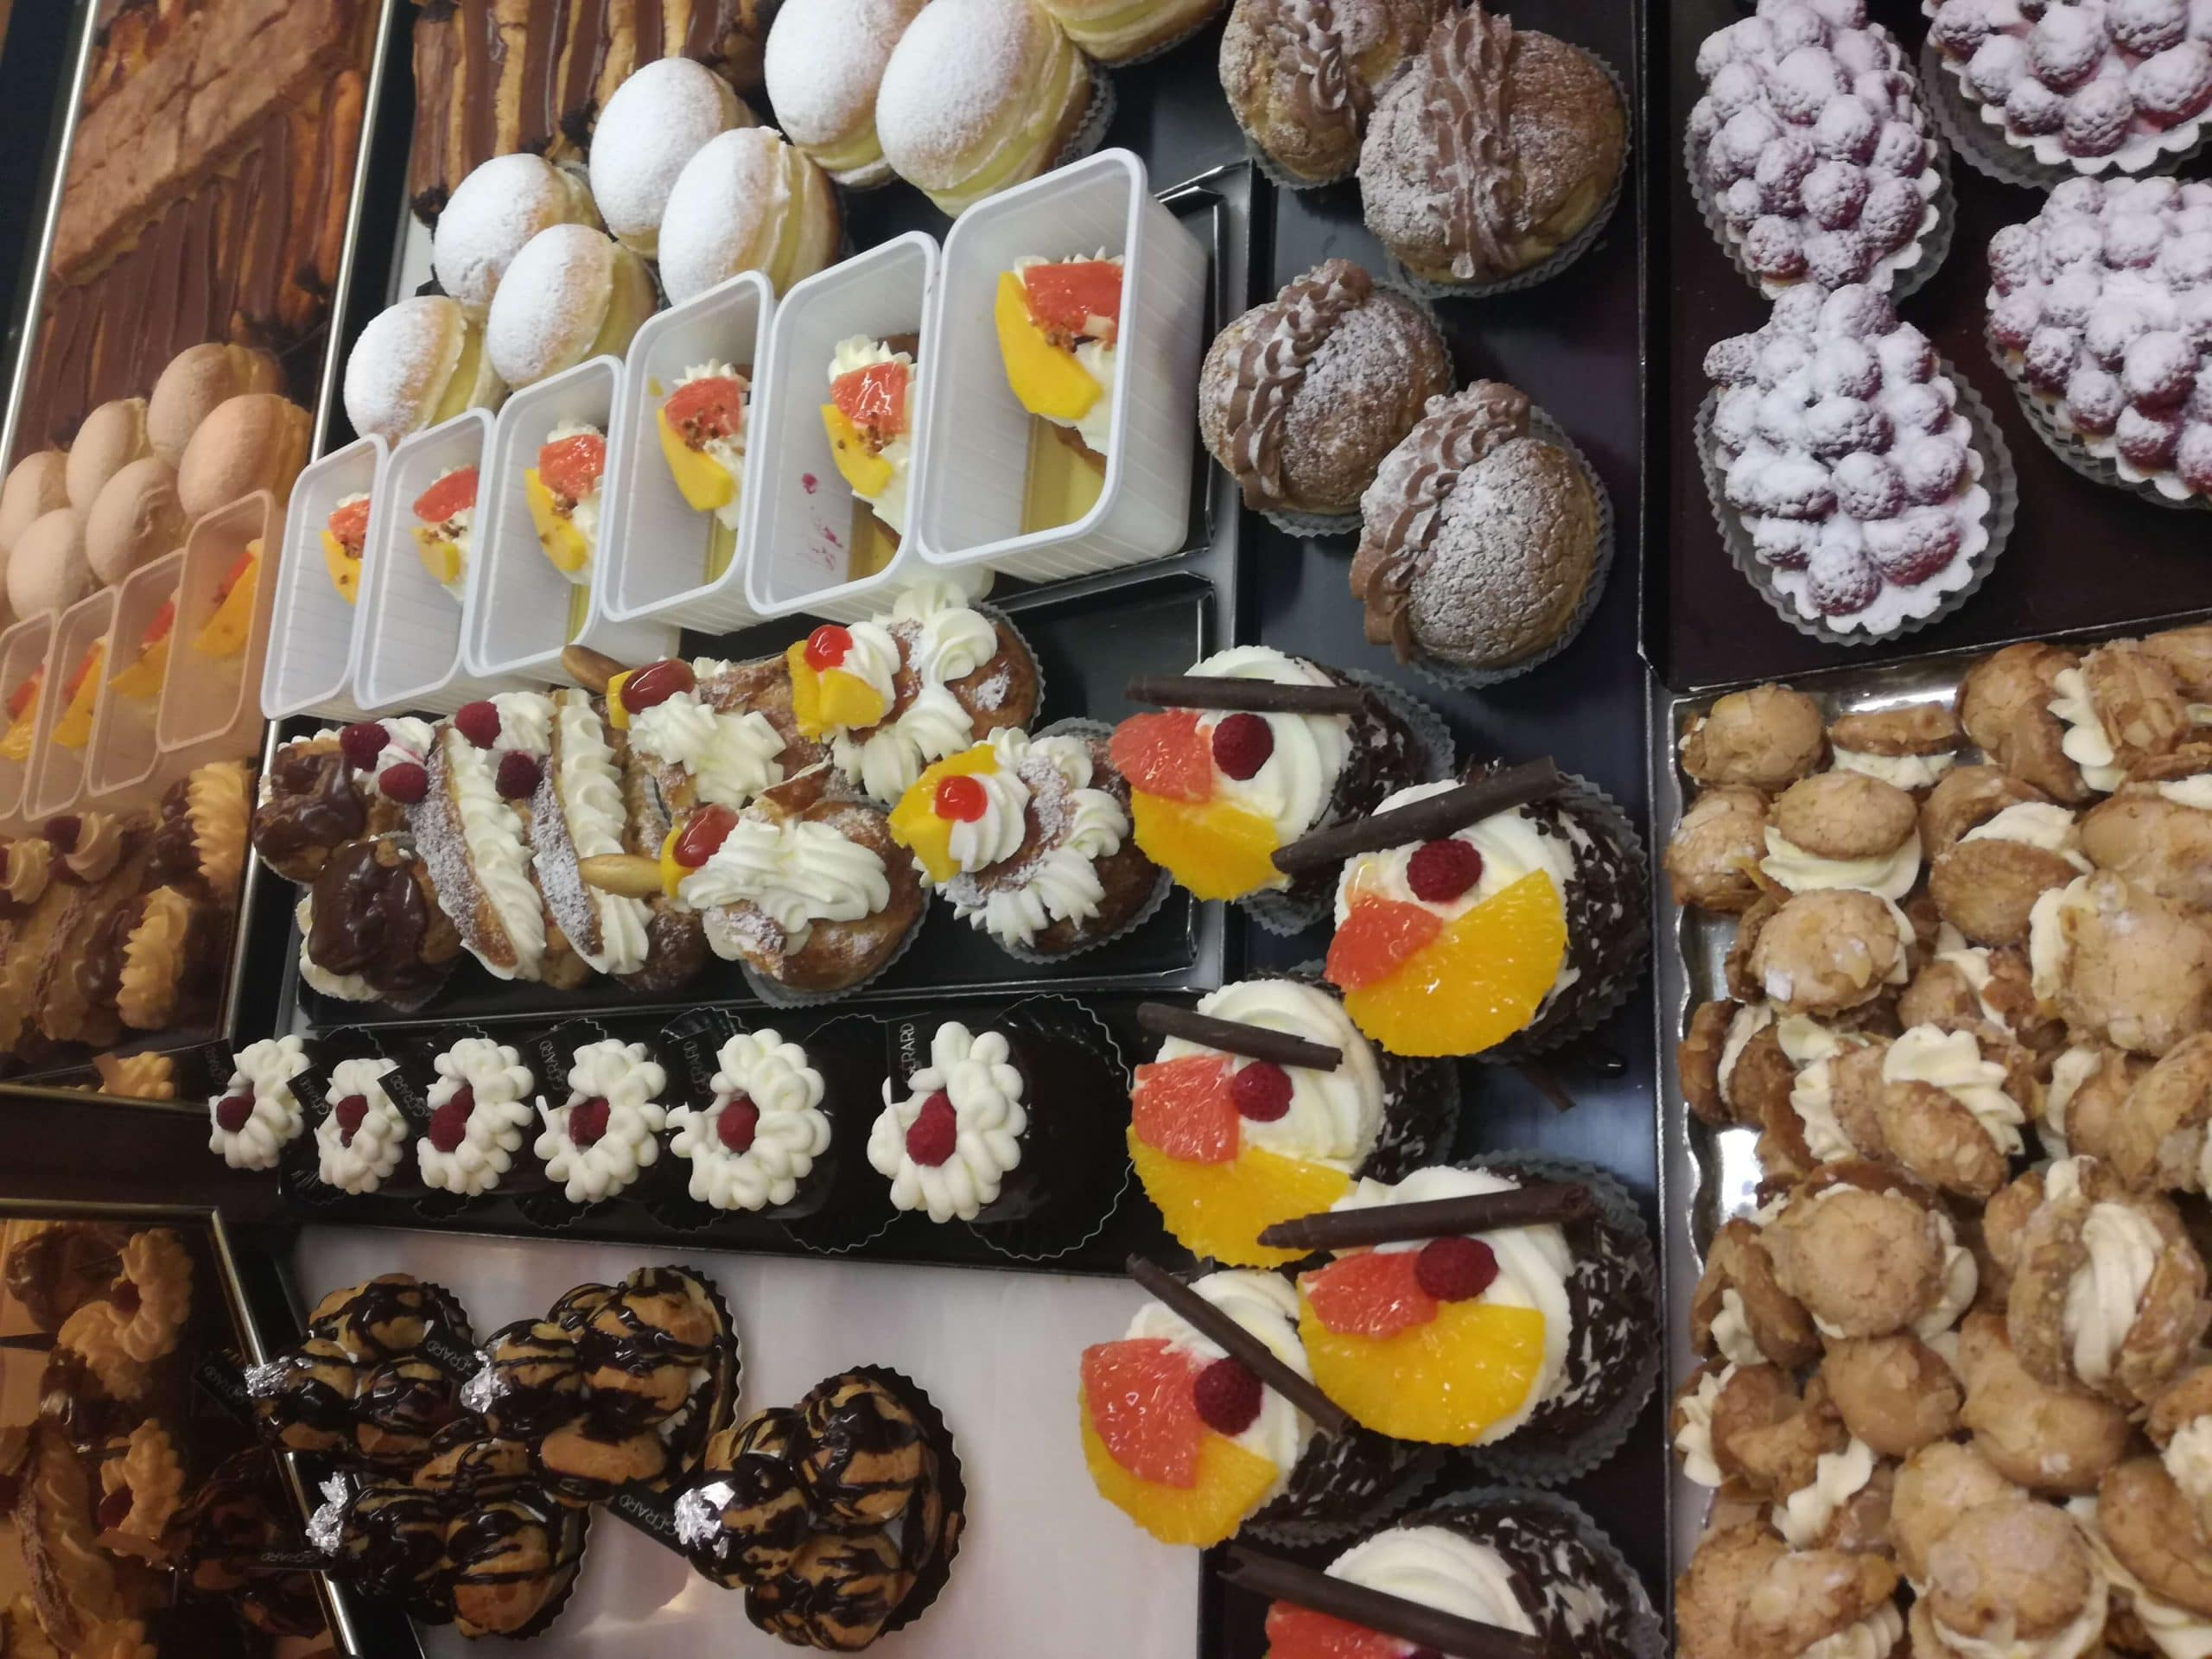 boulanger-7-specialiste-patisseries-liege